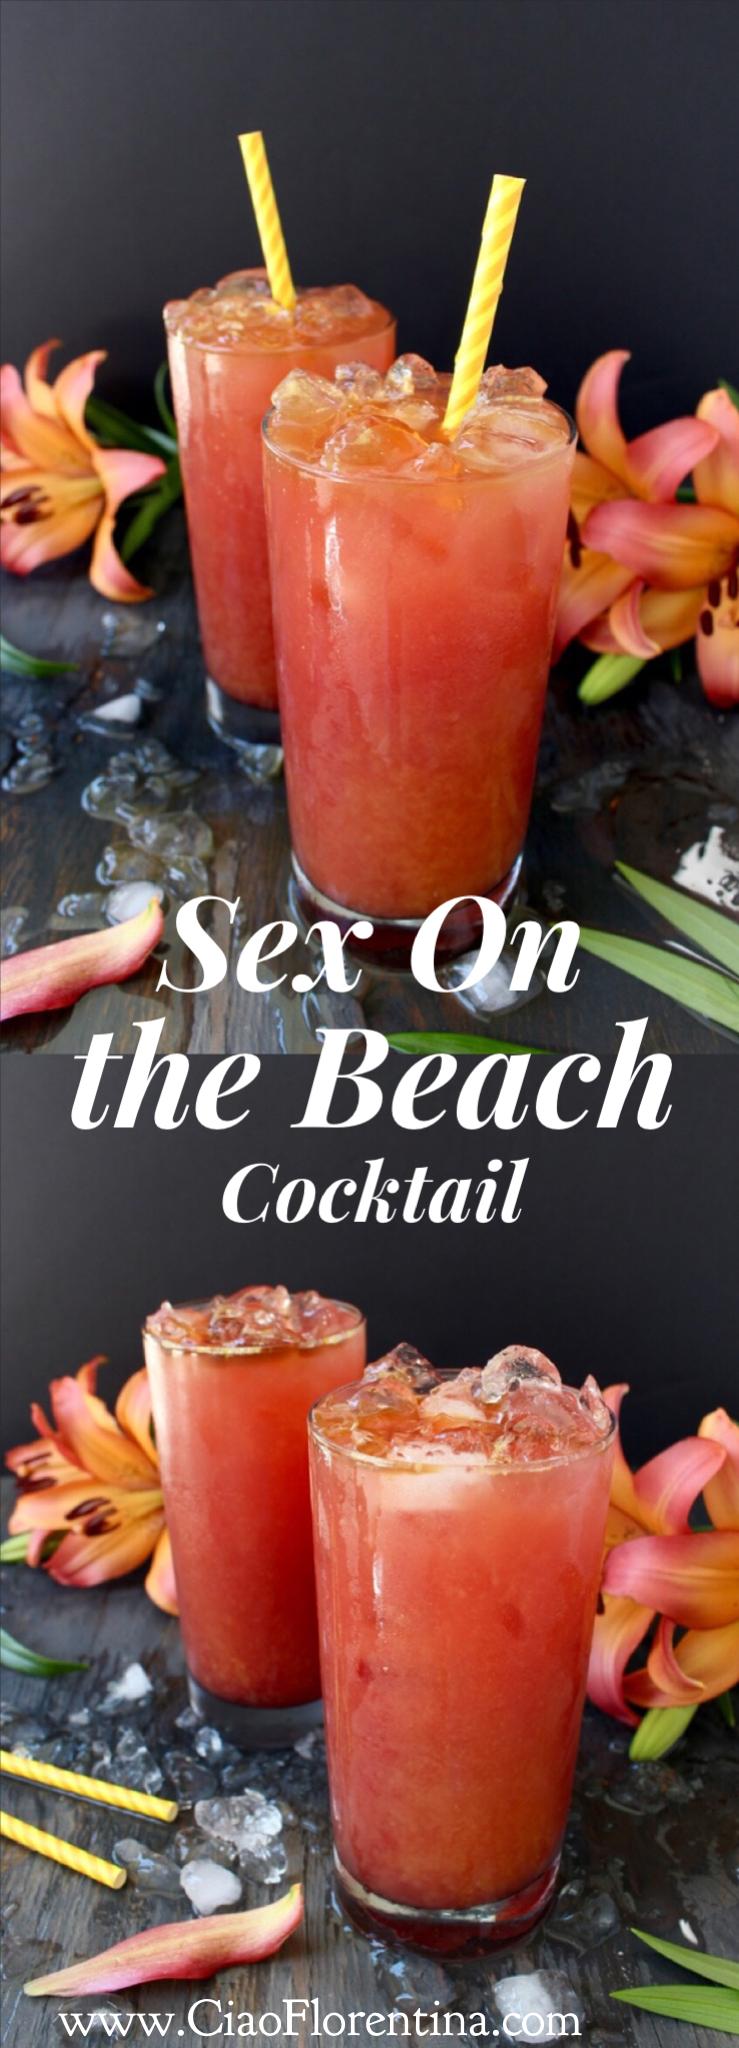 Sex On The Beach Drink #cocktaildrinks